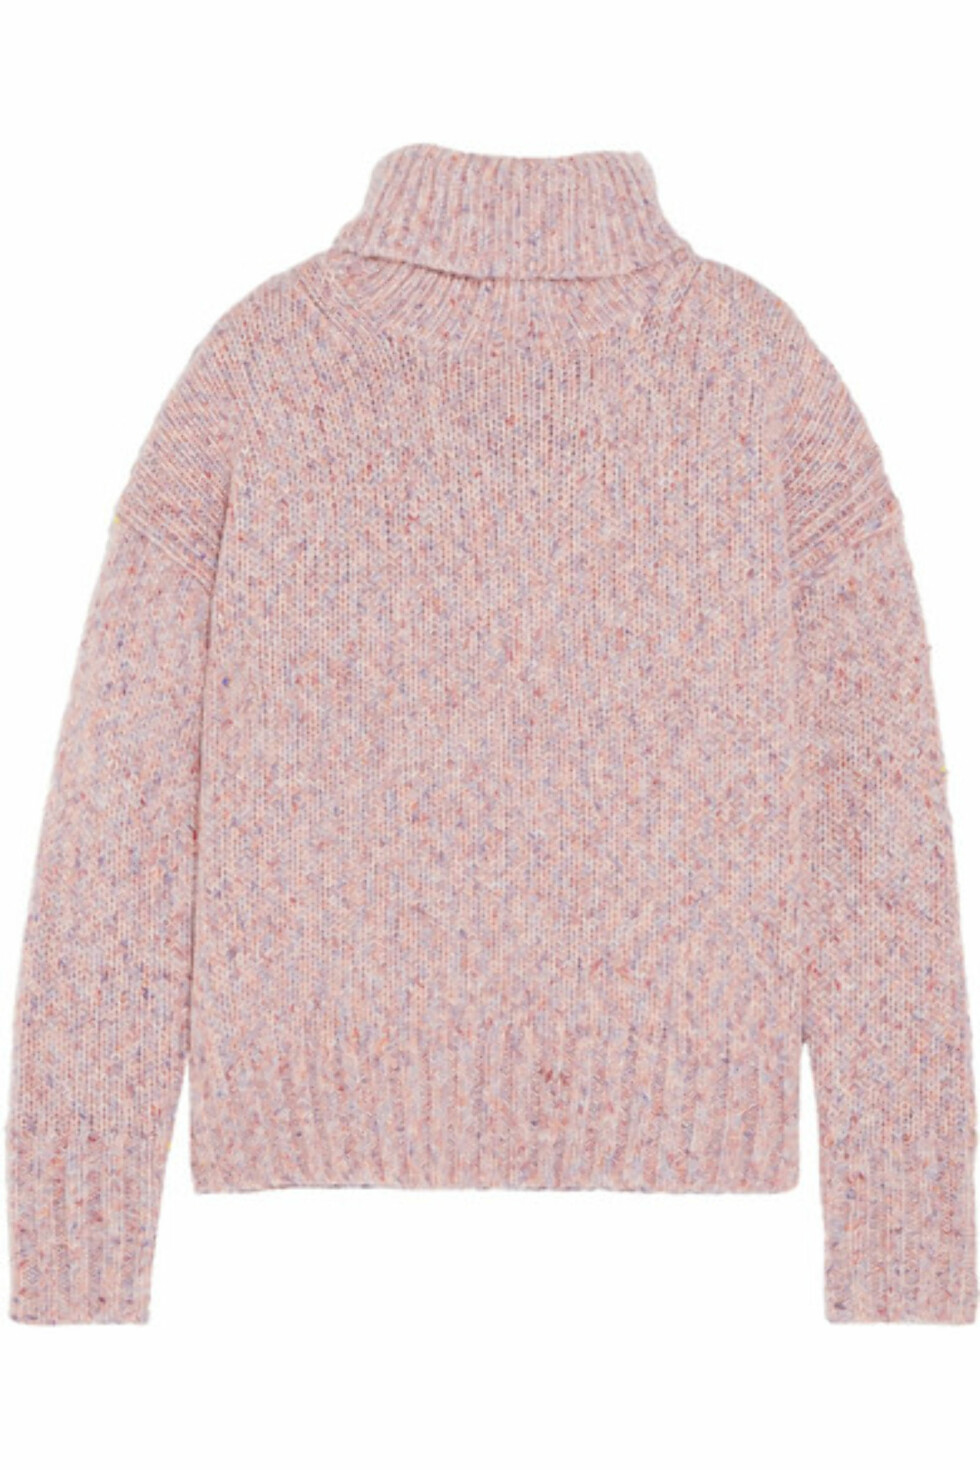 Genser fra J.Crew  1818,-  https://www.net-a-porter.com/no/en/product/975181/j_crew/martin-knitted-turtleneck-sweater